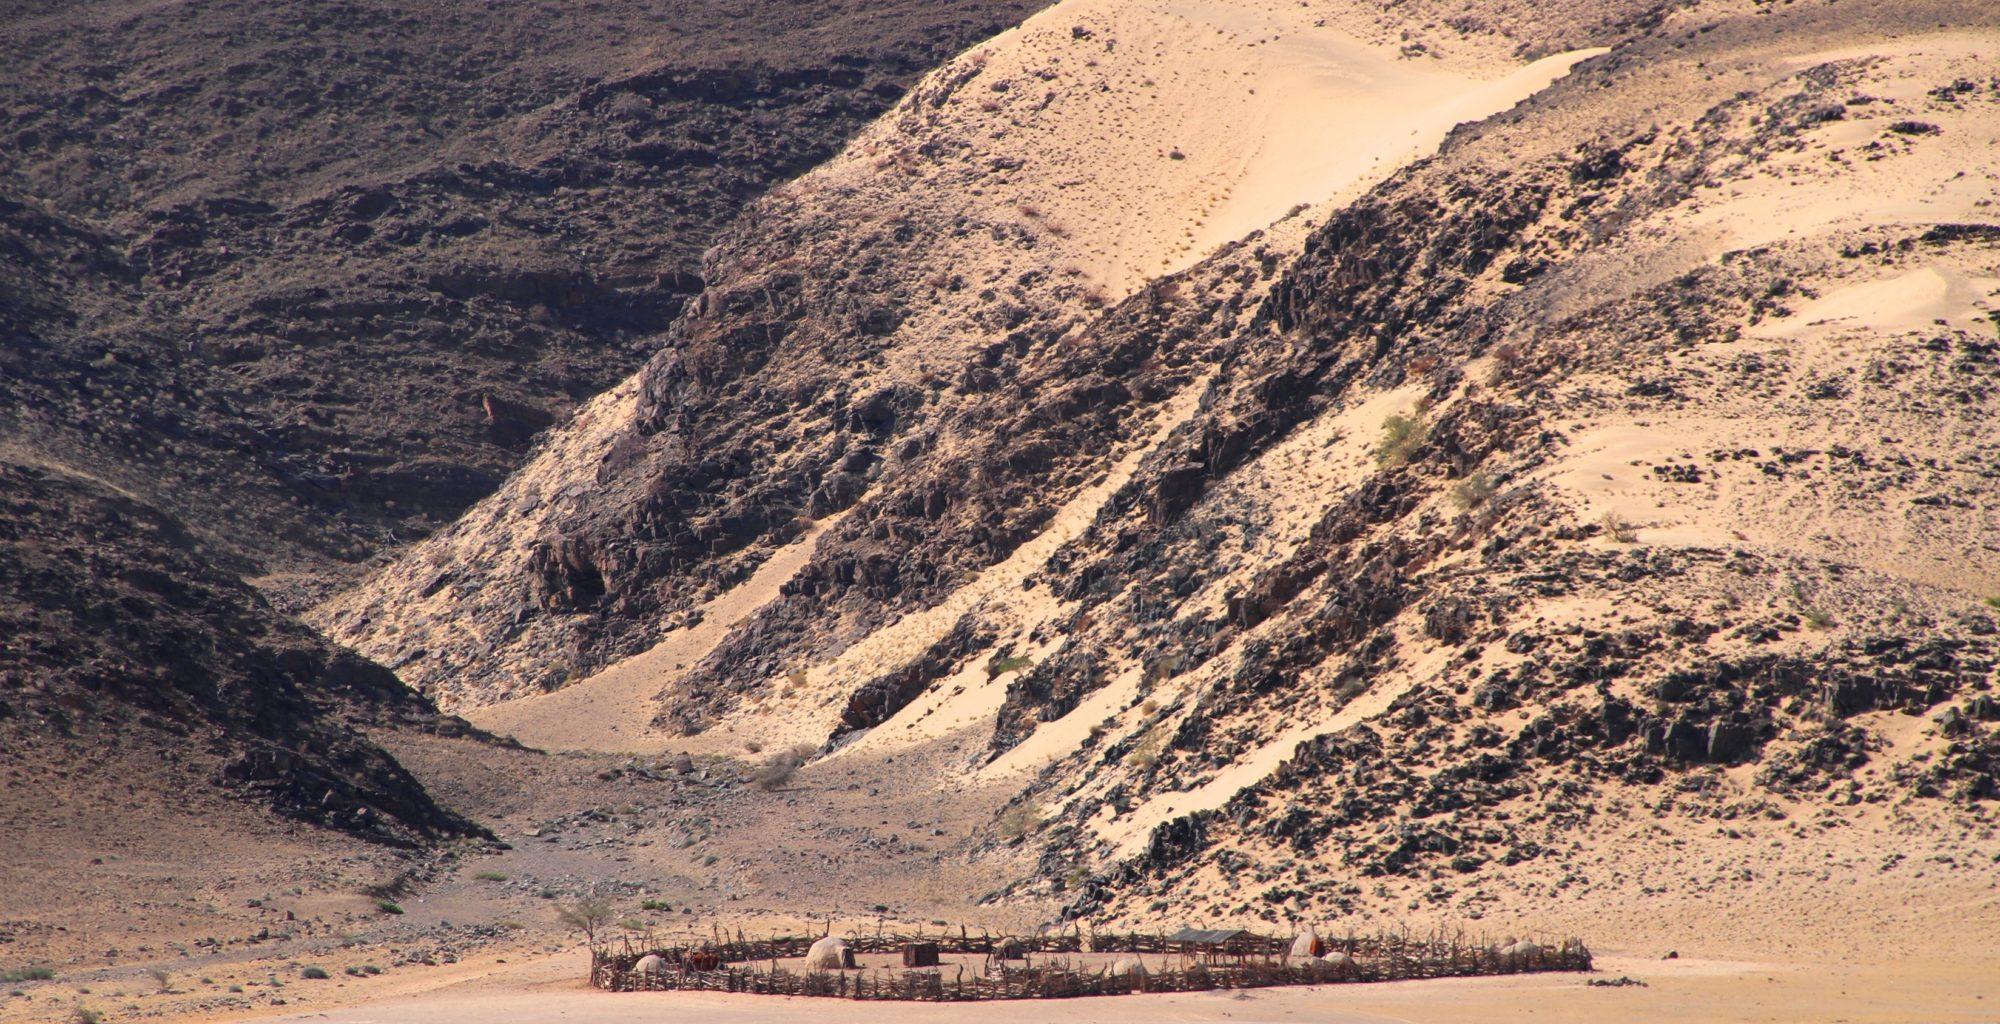 Namibia-Skeleton-Coast-Safari-Landscape